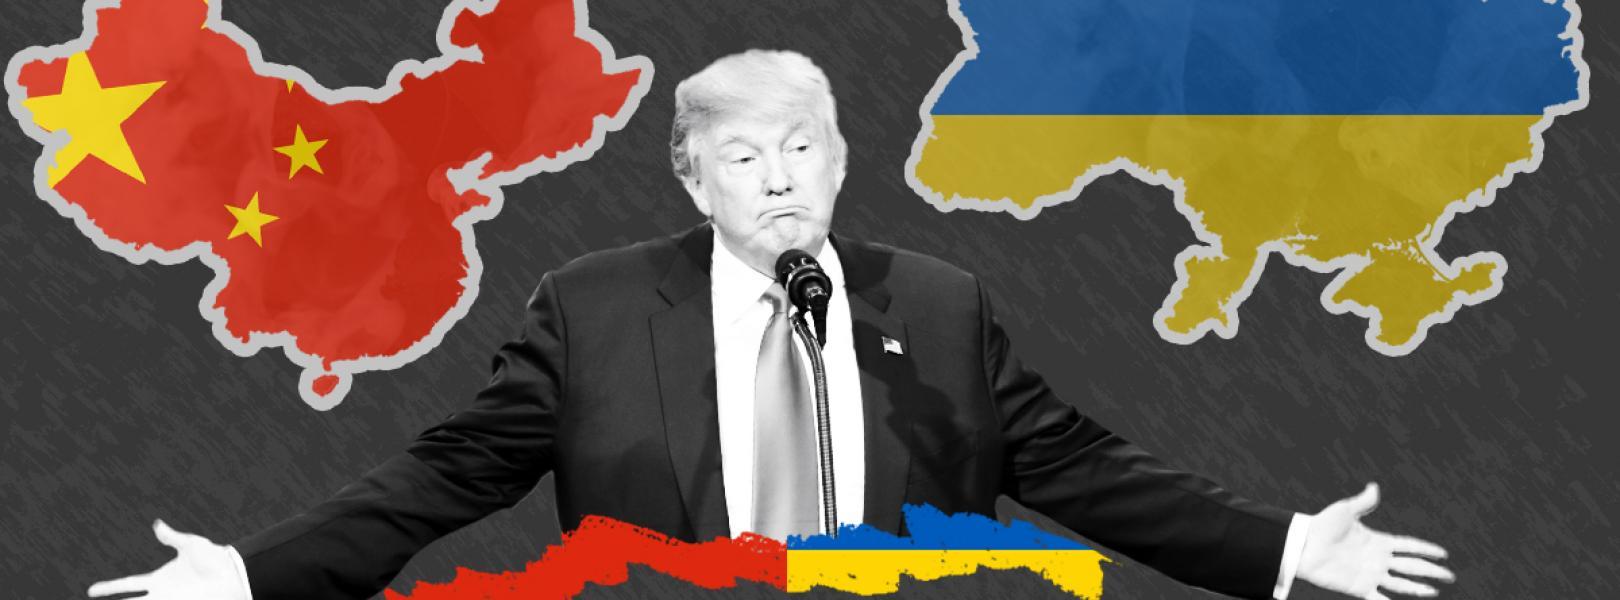 Donald Trump with China and Ukraine